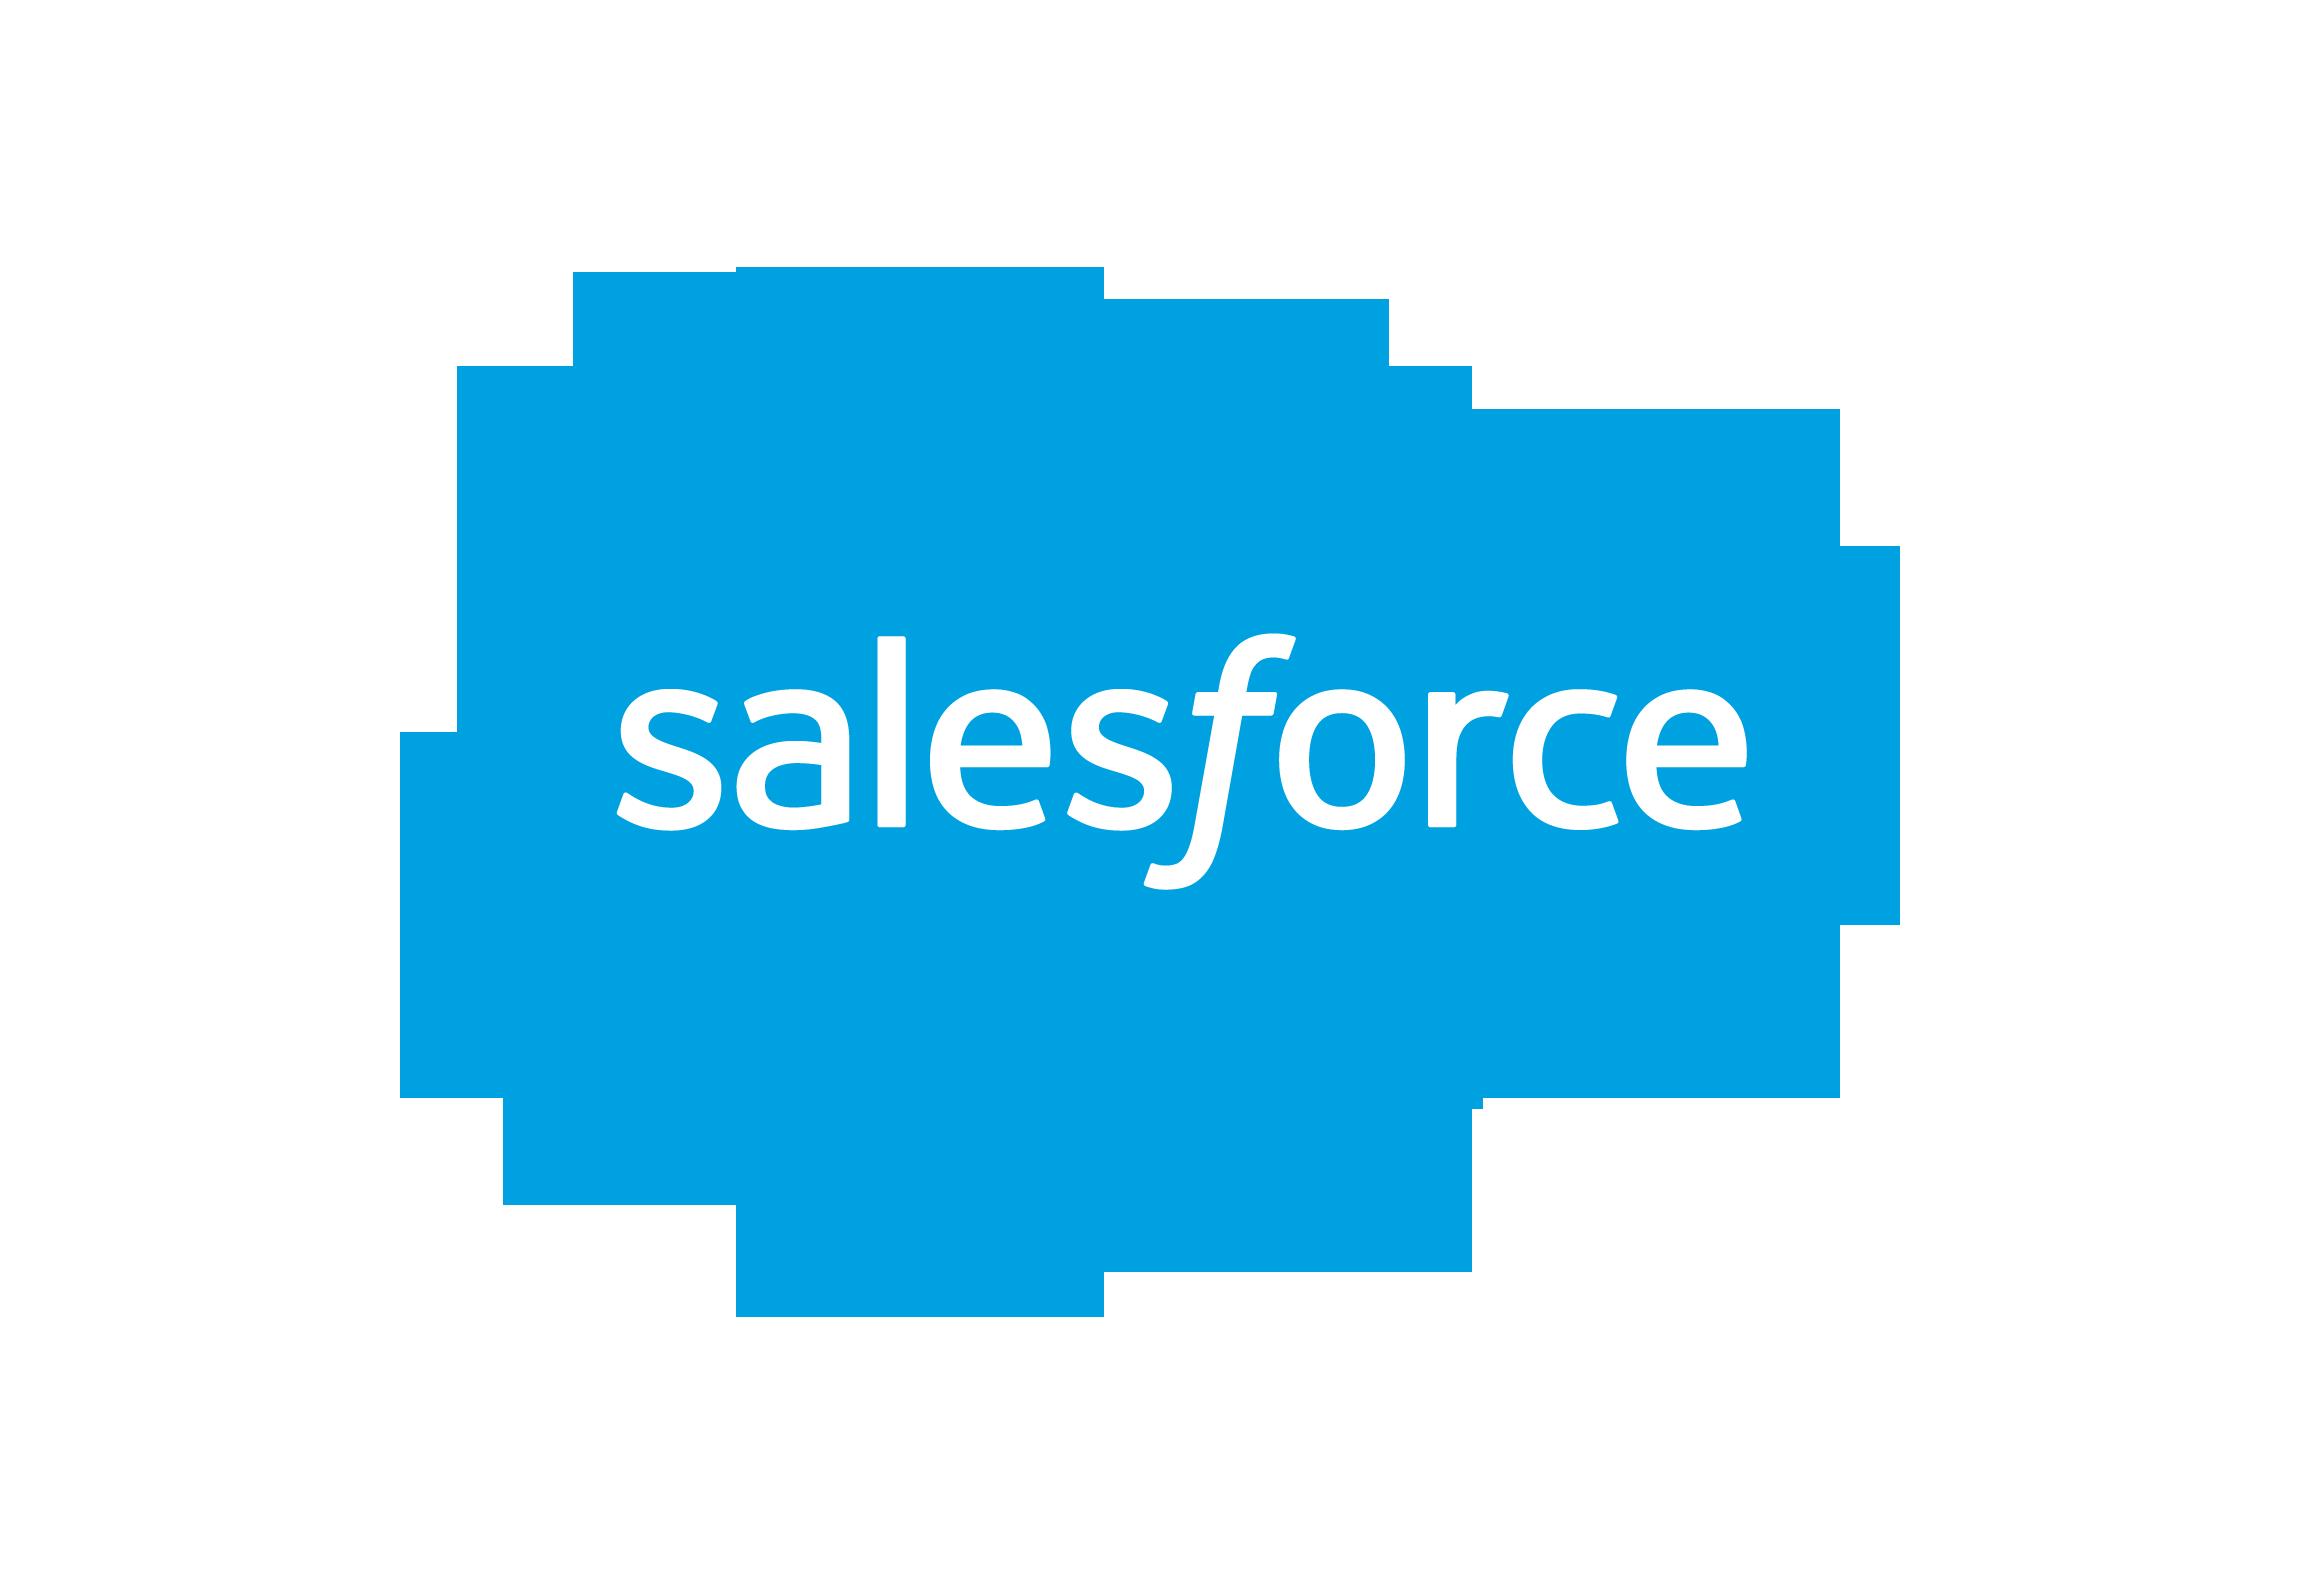 salesforce-logo-vector-png-salesforce-logo-png-2300